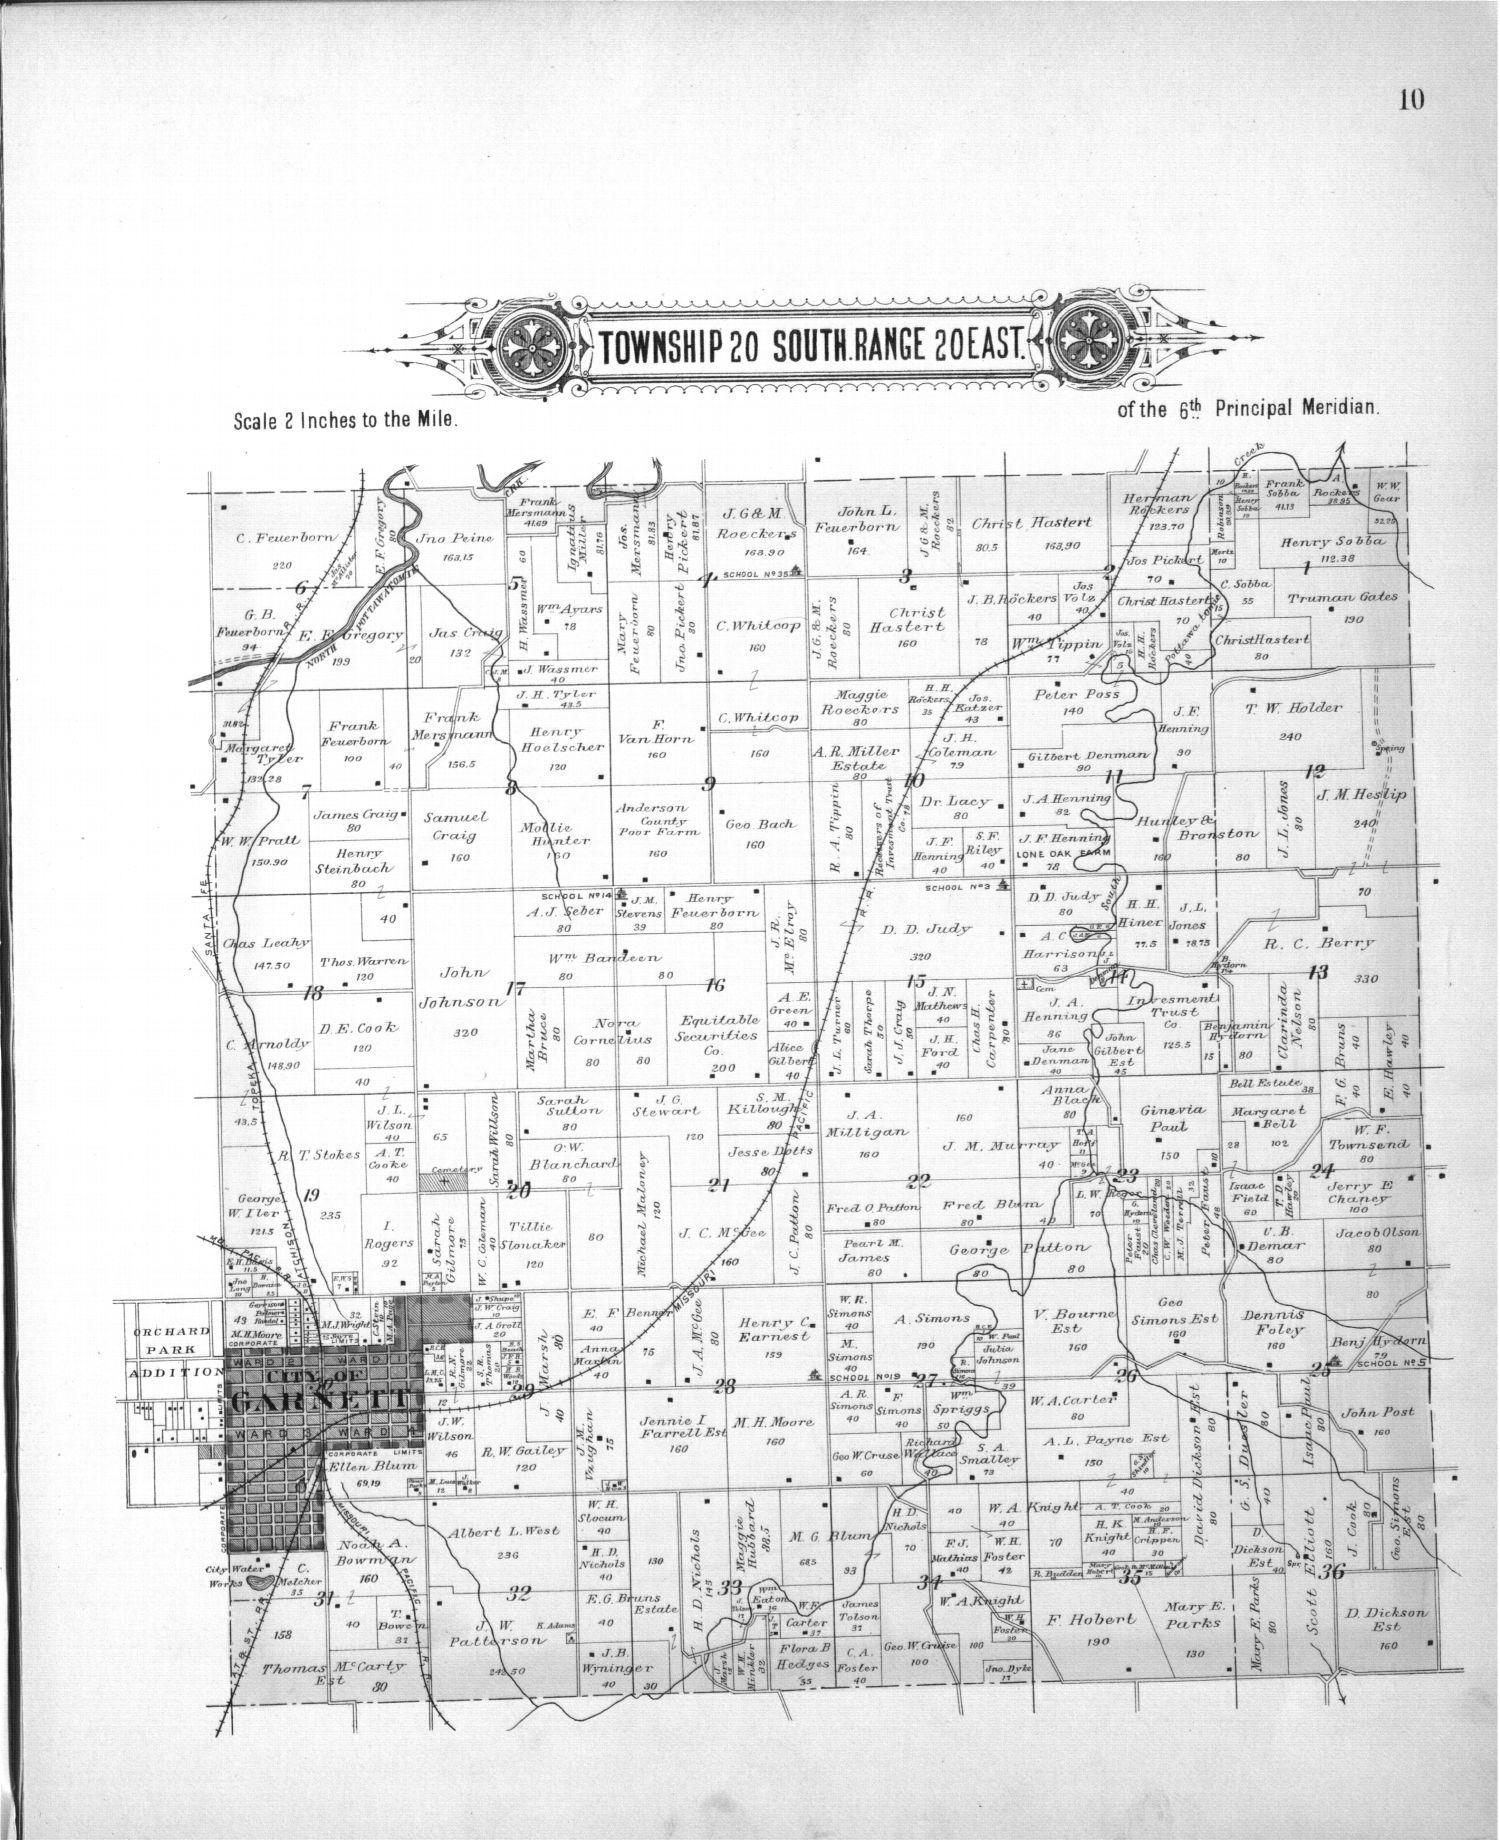 Plat book, Anderson County, Kansas - 7